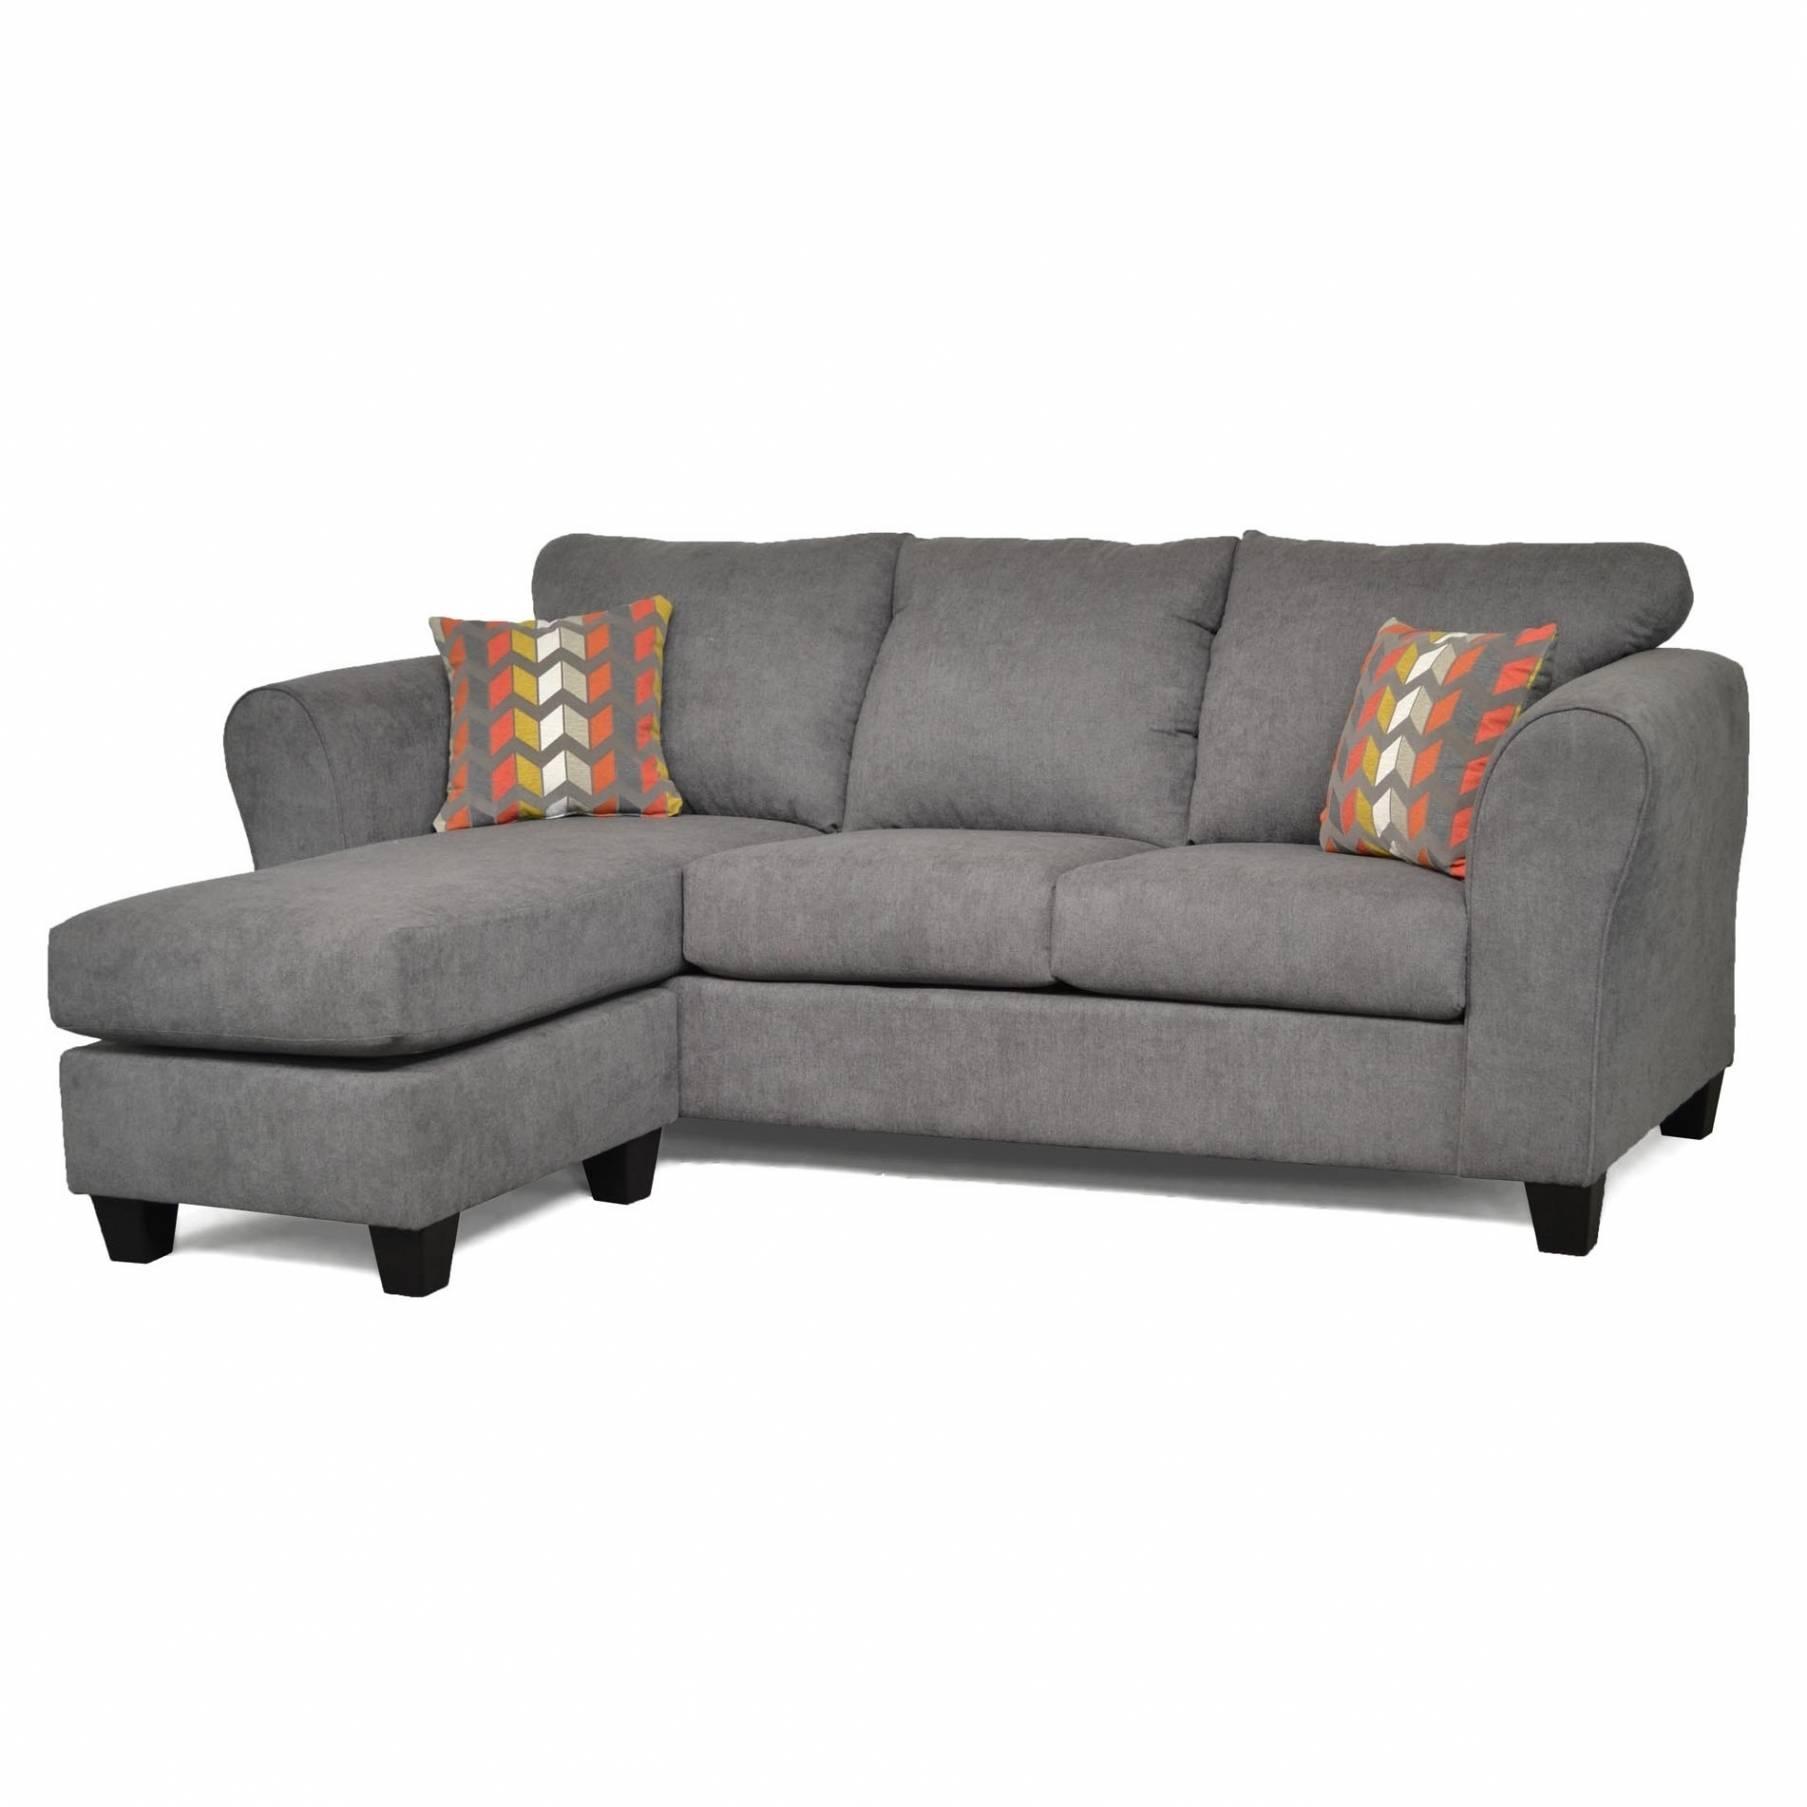 Sofas Center : 51 Unique King Size Sleeper Sofa Image Inspirations within King Size Sleeper Sofa Sectional (Image 20 of 30)